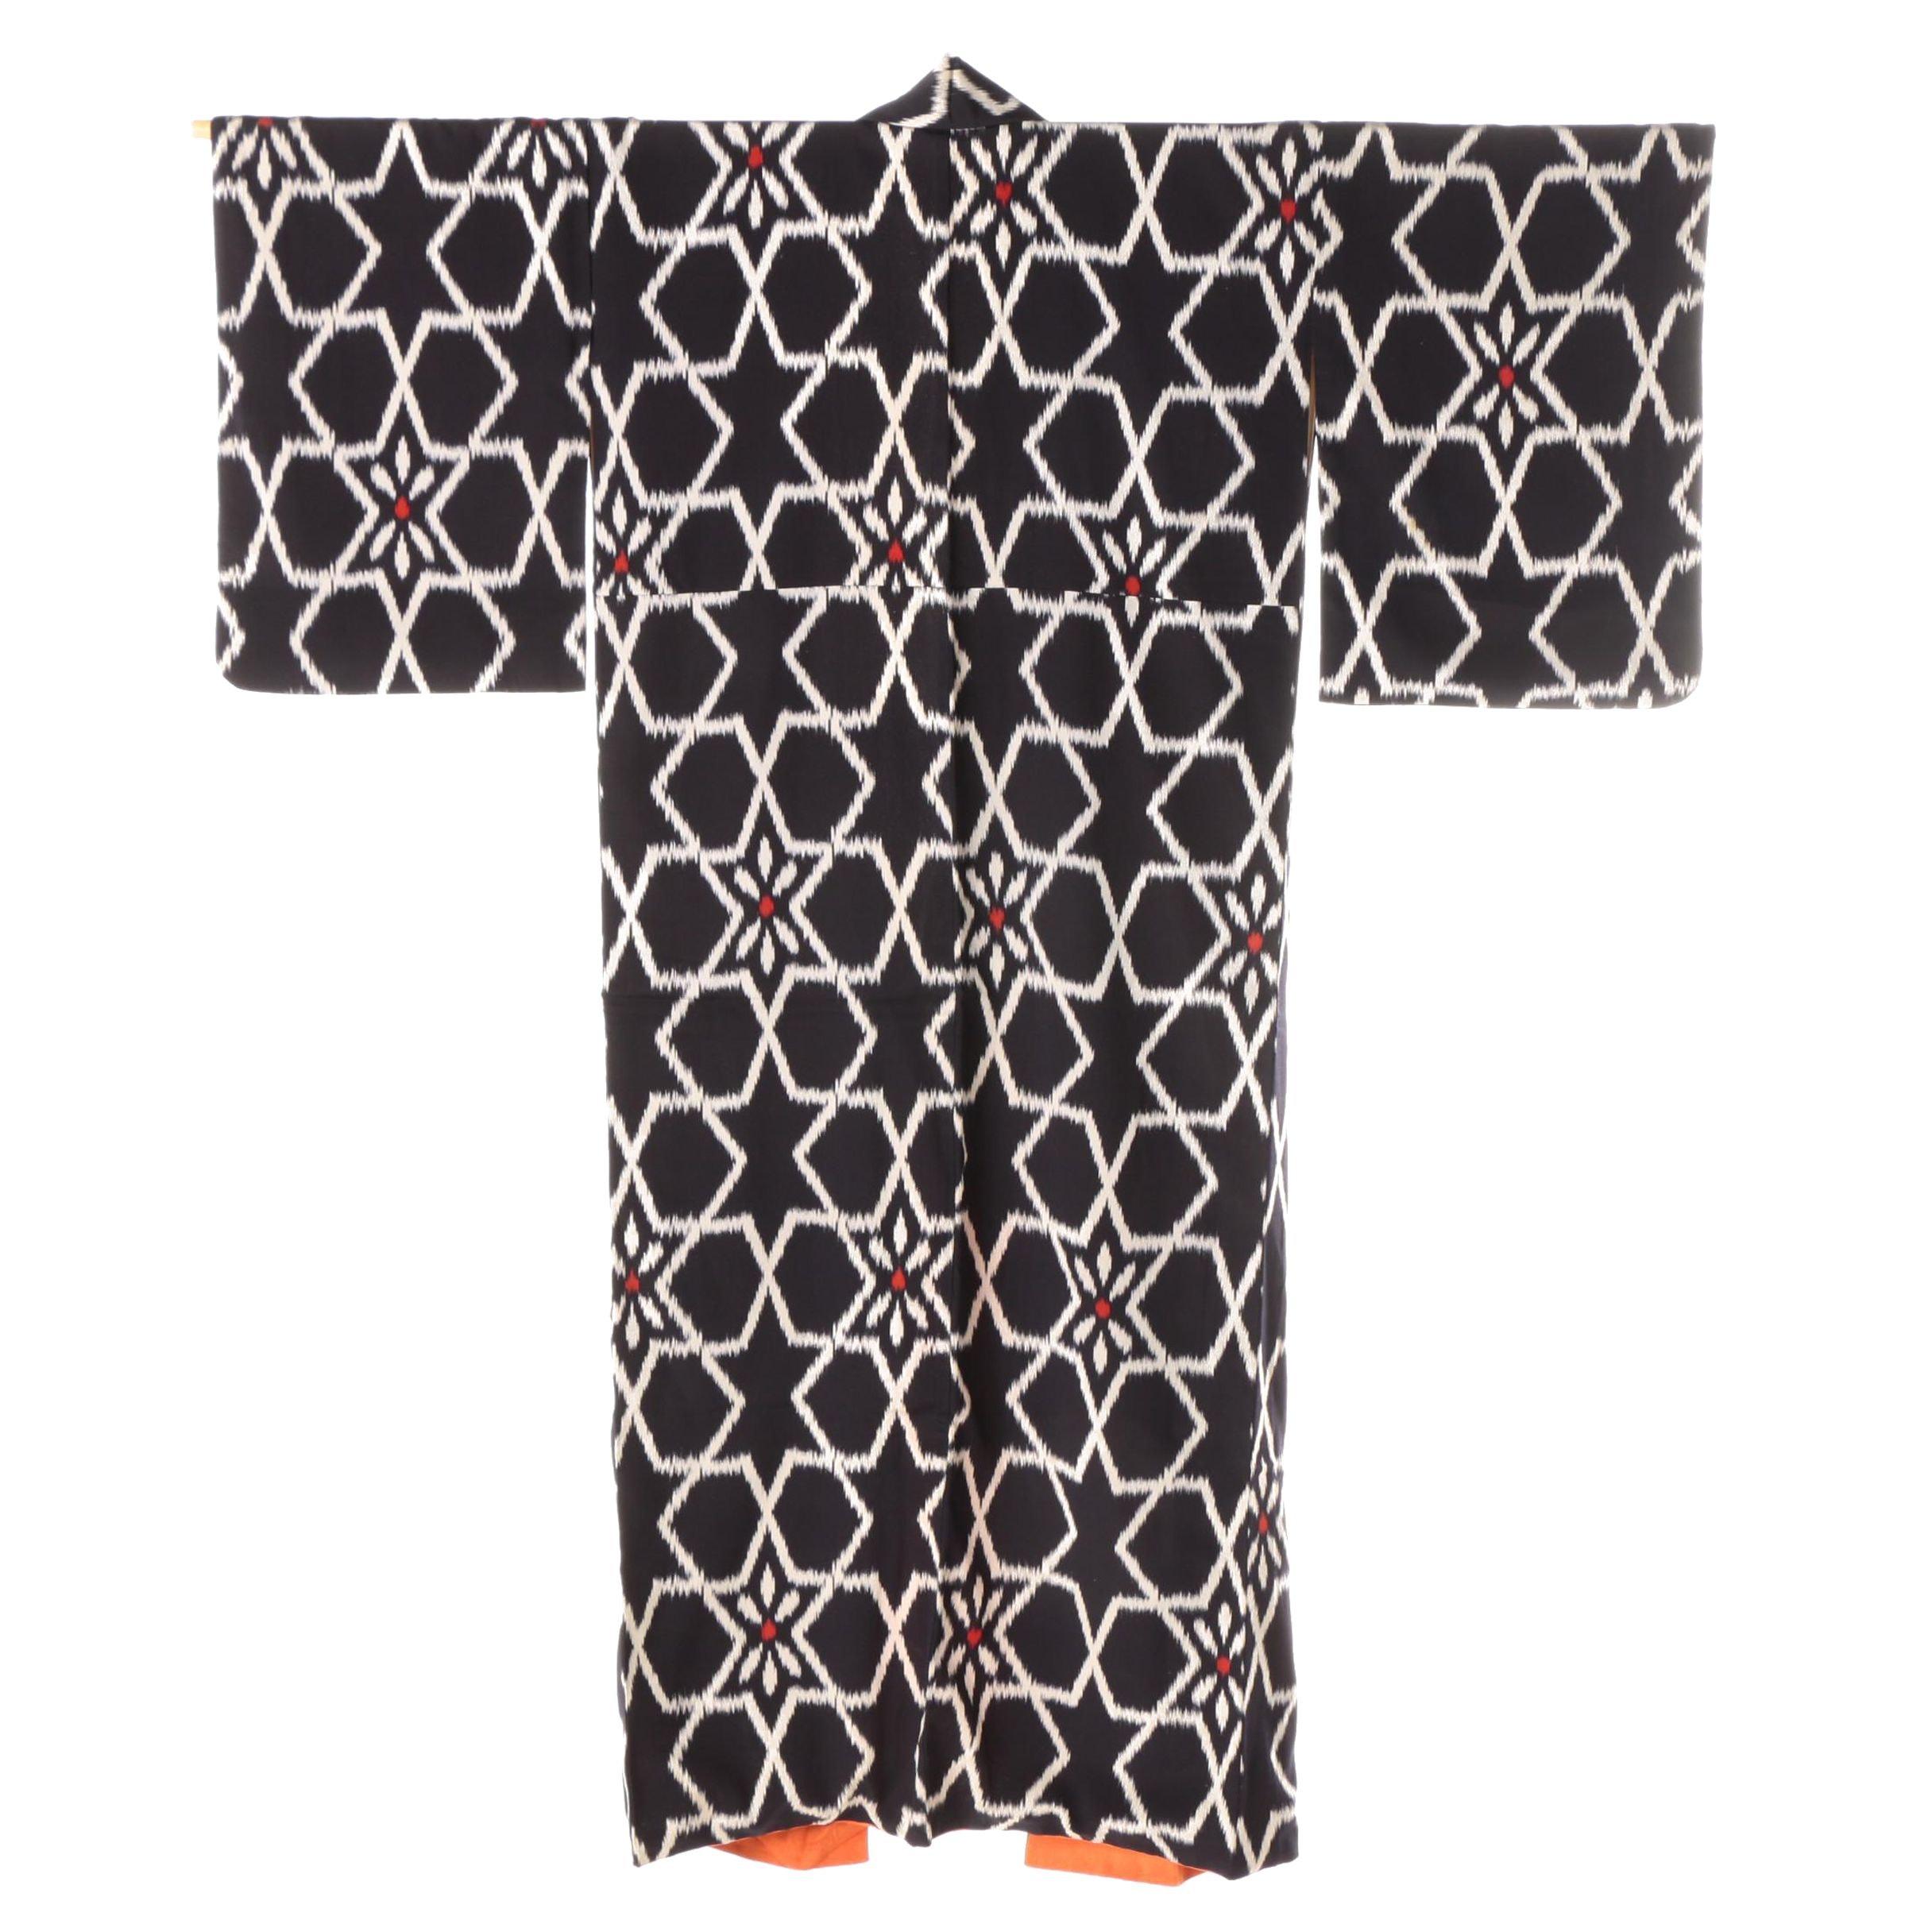 Circa 1940s Vintage Japanese Handwoven Silk Ikat Kimono